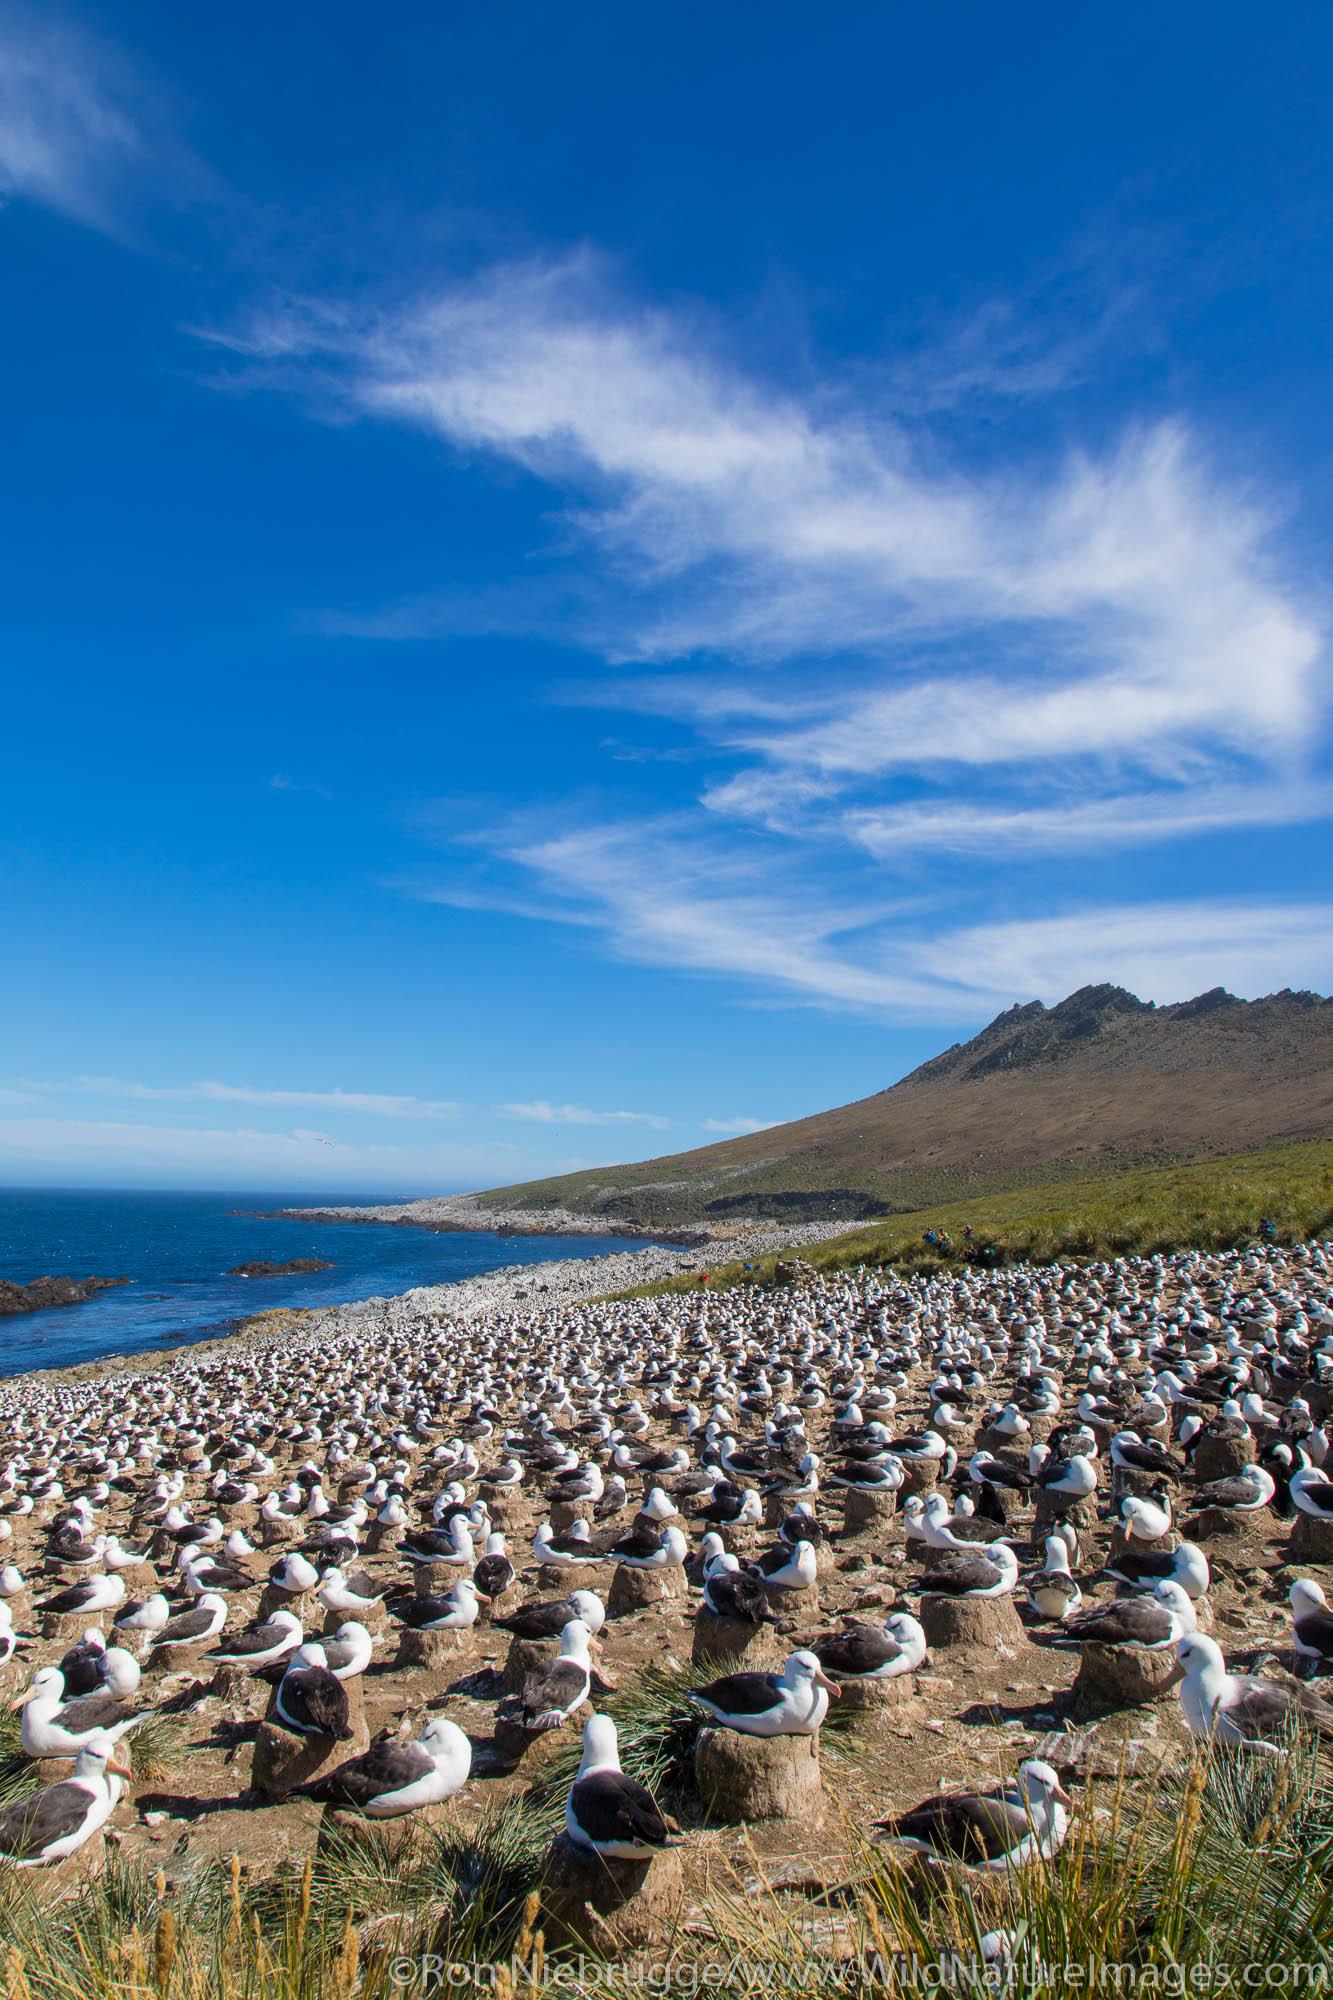 Black-browed Albatross colony, Steeple Jason Island, Falkland Islands.